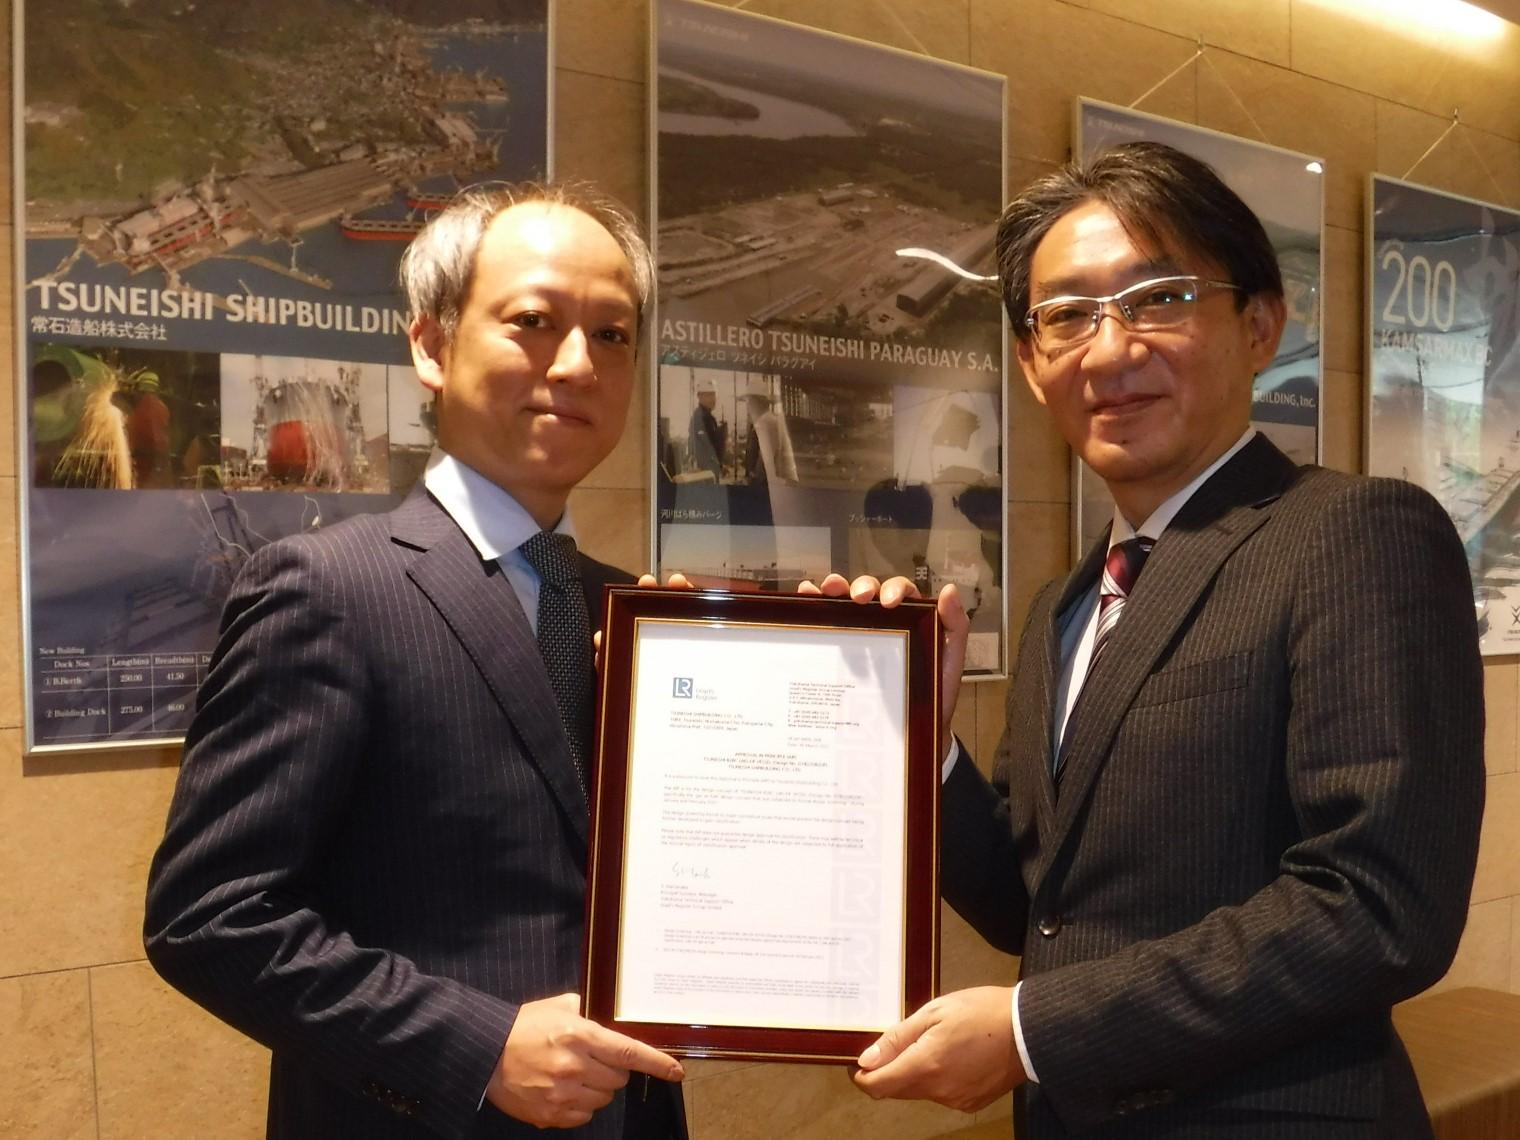 Keiichiro Sho, General Manager, Ship Sales Dept., TSUNEISHI SHIPBUILDING (right), Hideo Natsui, Lead Surveyor, Lloyd's Register (left)